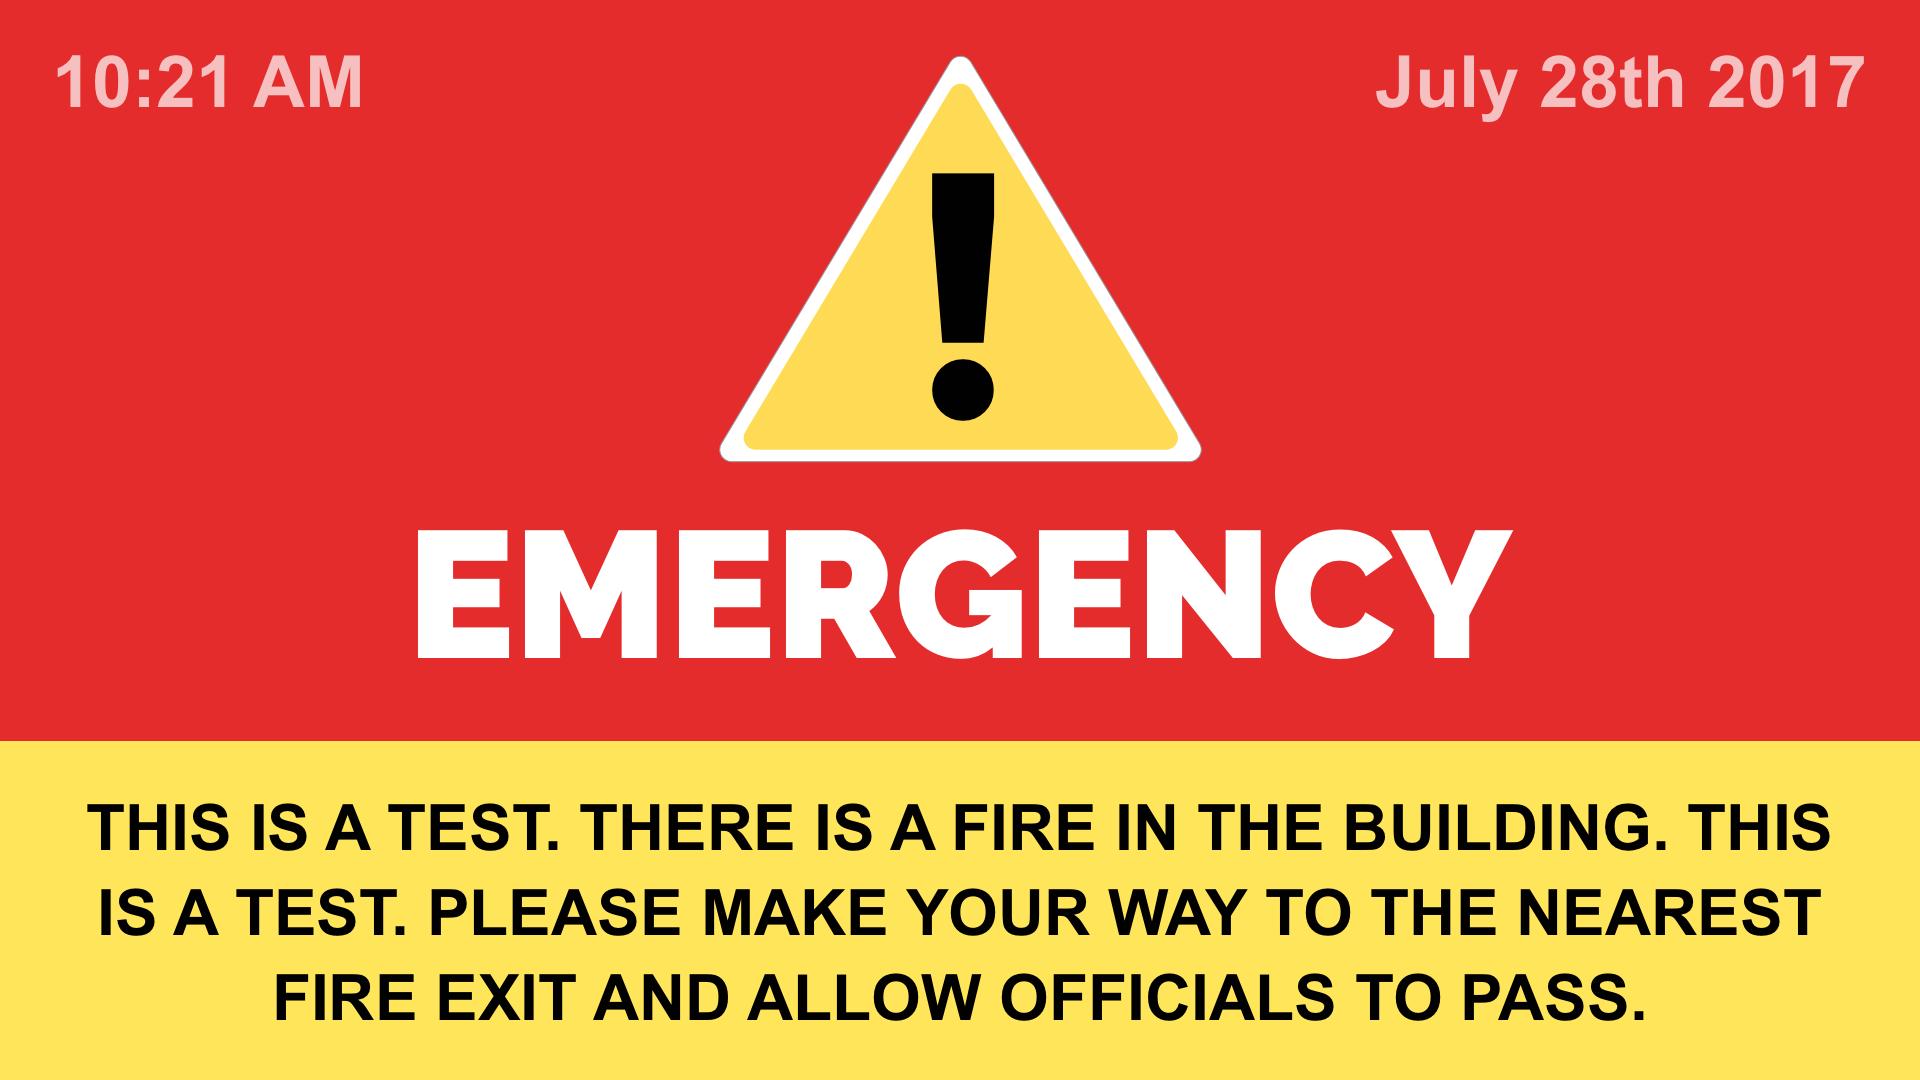 emergency alert on digital signage